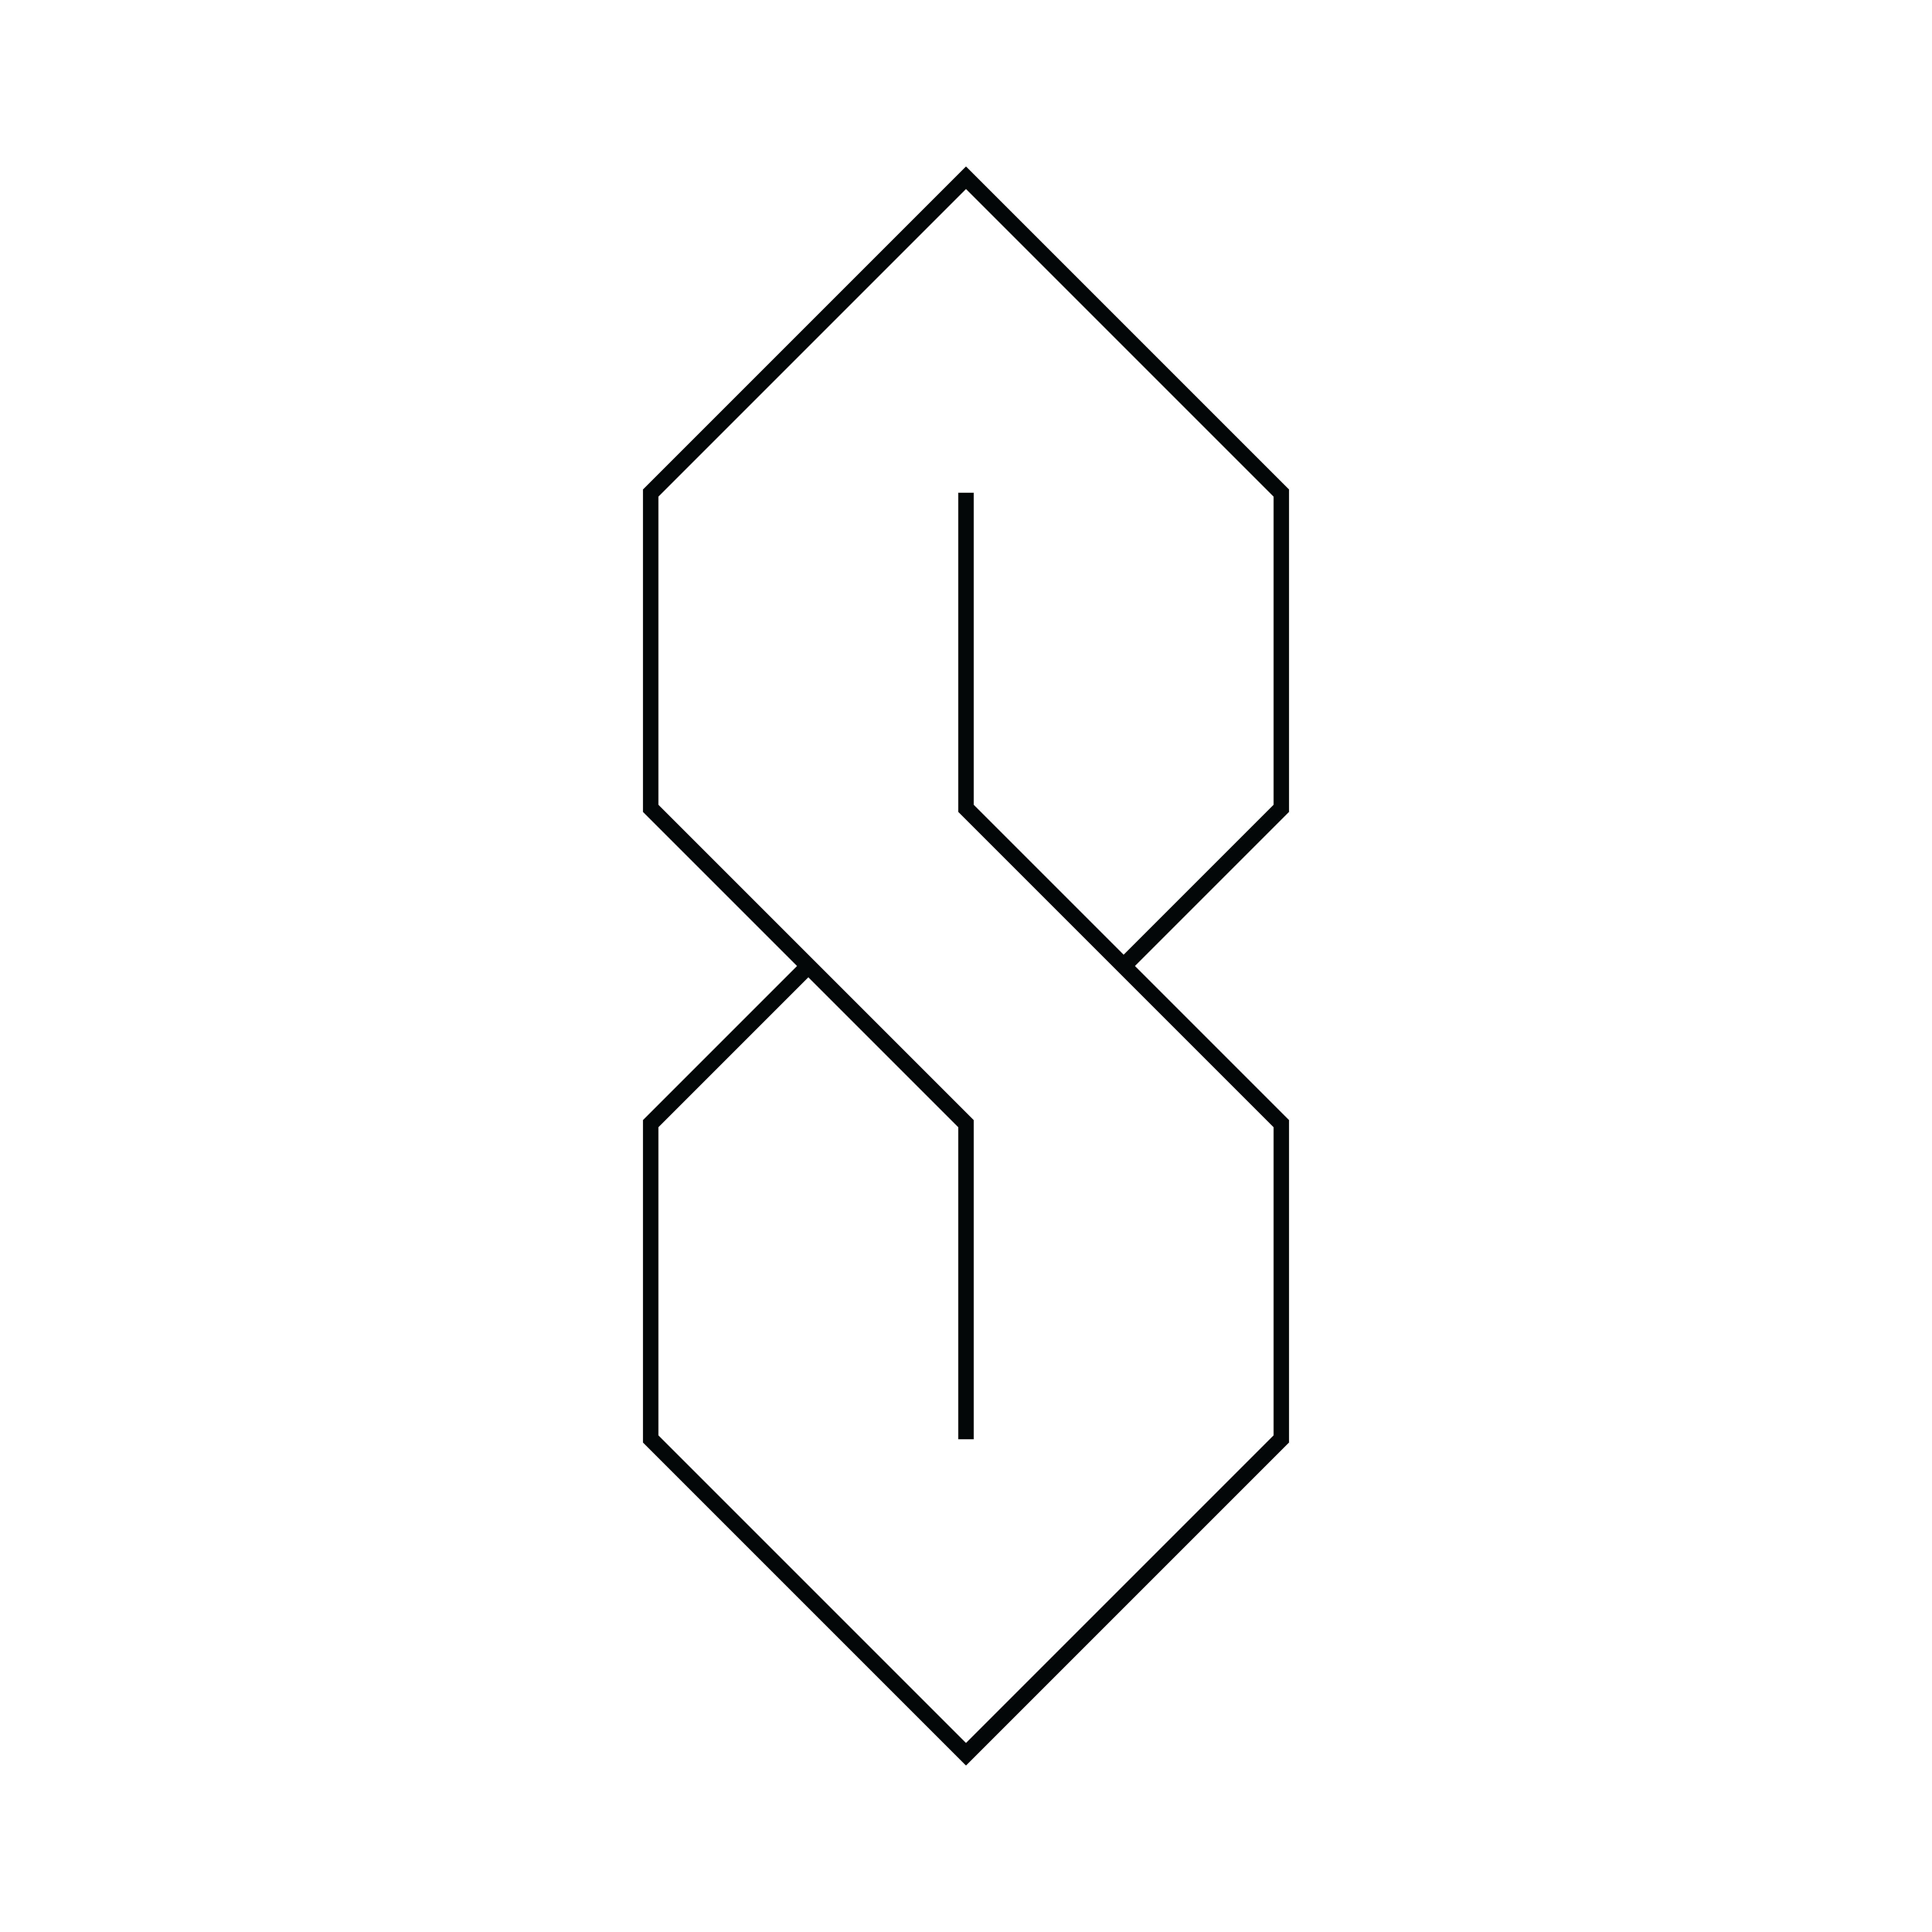 204366378 furthermore 2112301 Yota Icons additionally Ninjasnake besides Bugs Bunny moreover 13 Desktop Wallpapers To Kickstart Your Creativity. on moving logo ideas